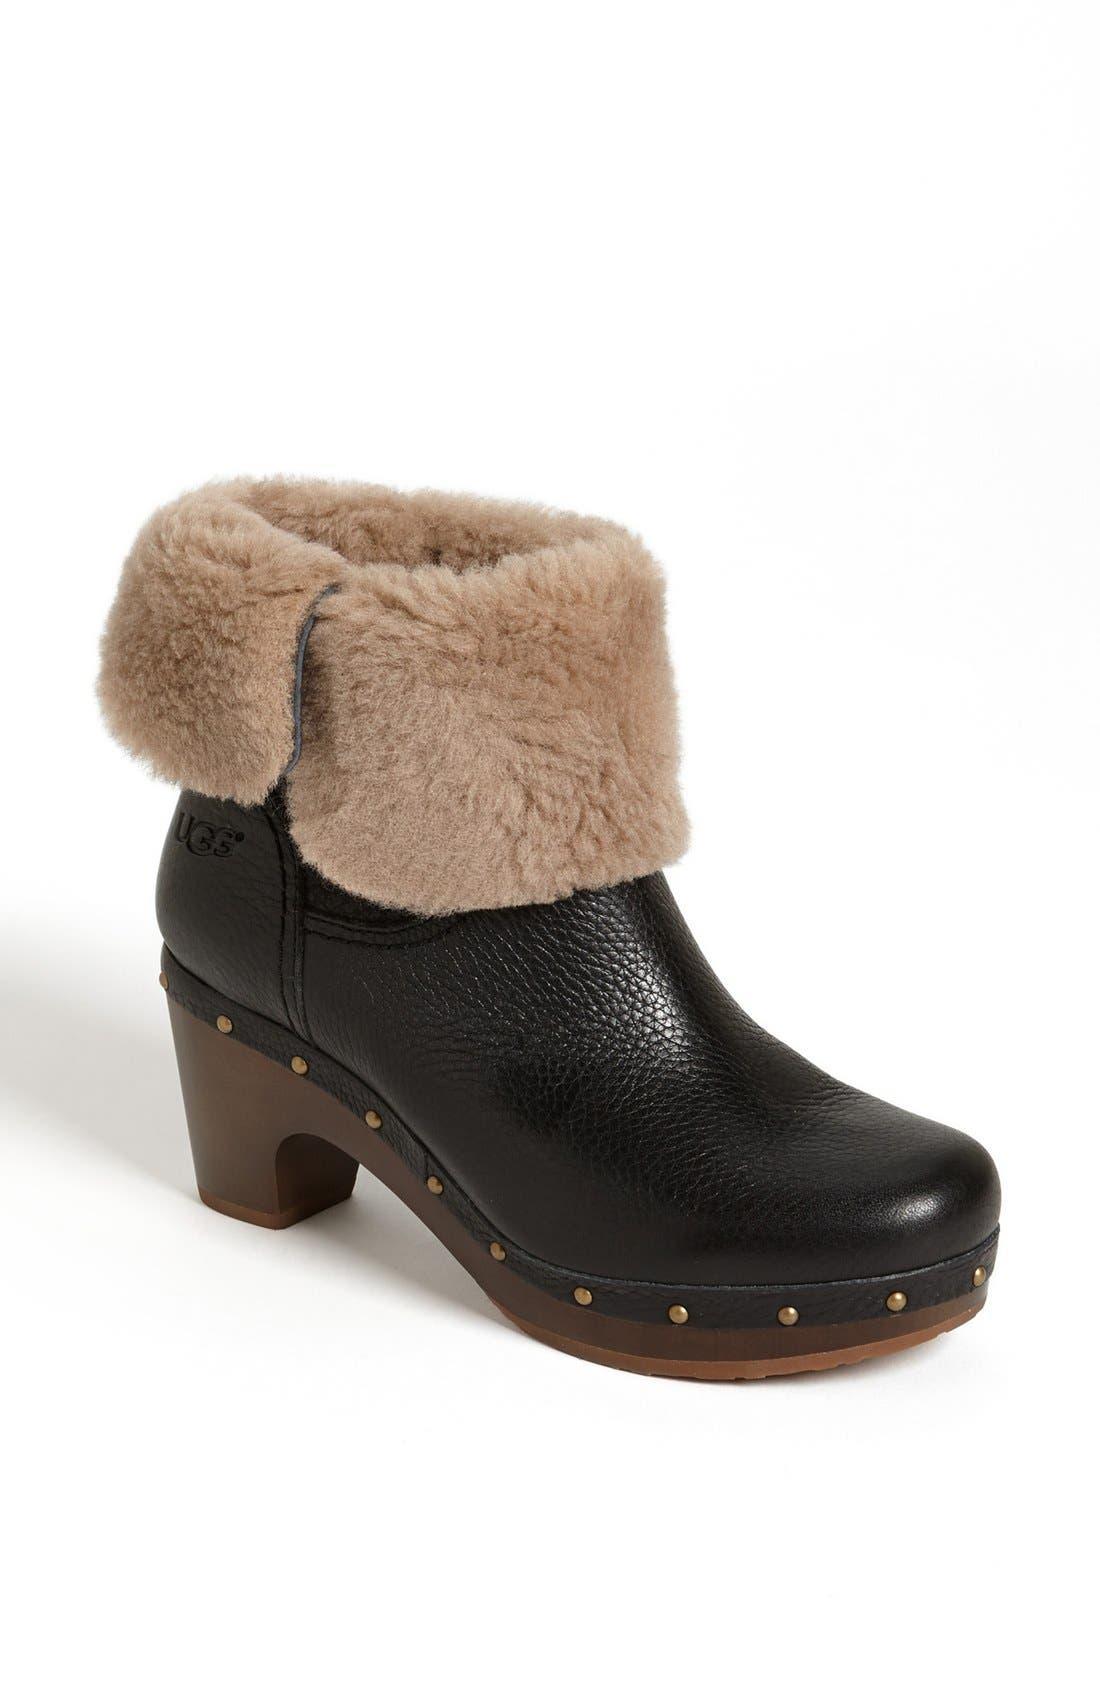 Main Image - UGG® Australia 'Amoret' Boot (Women)